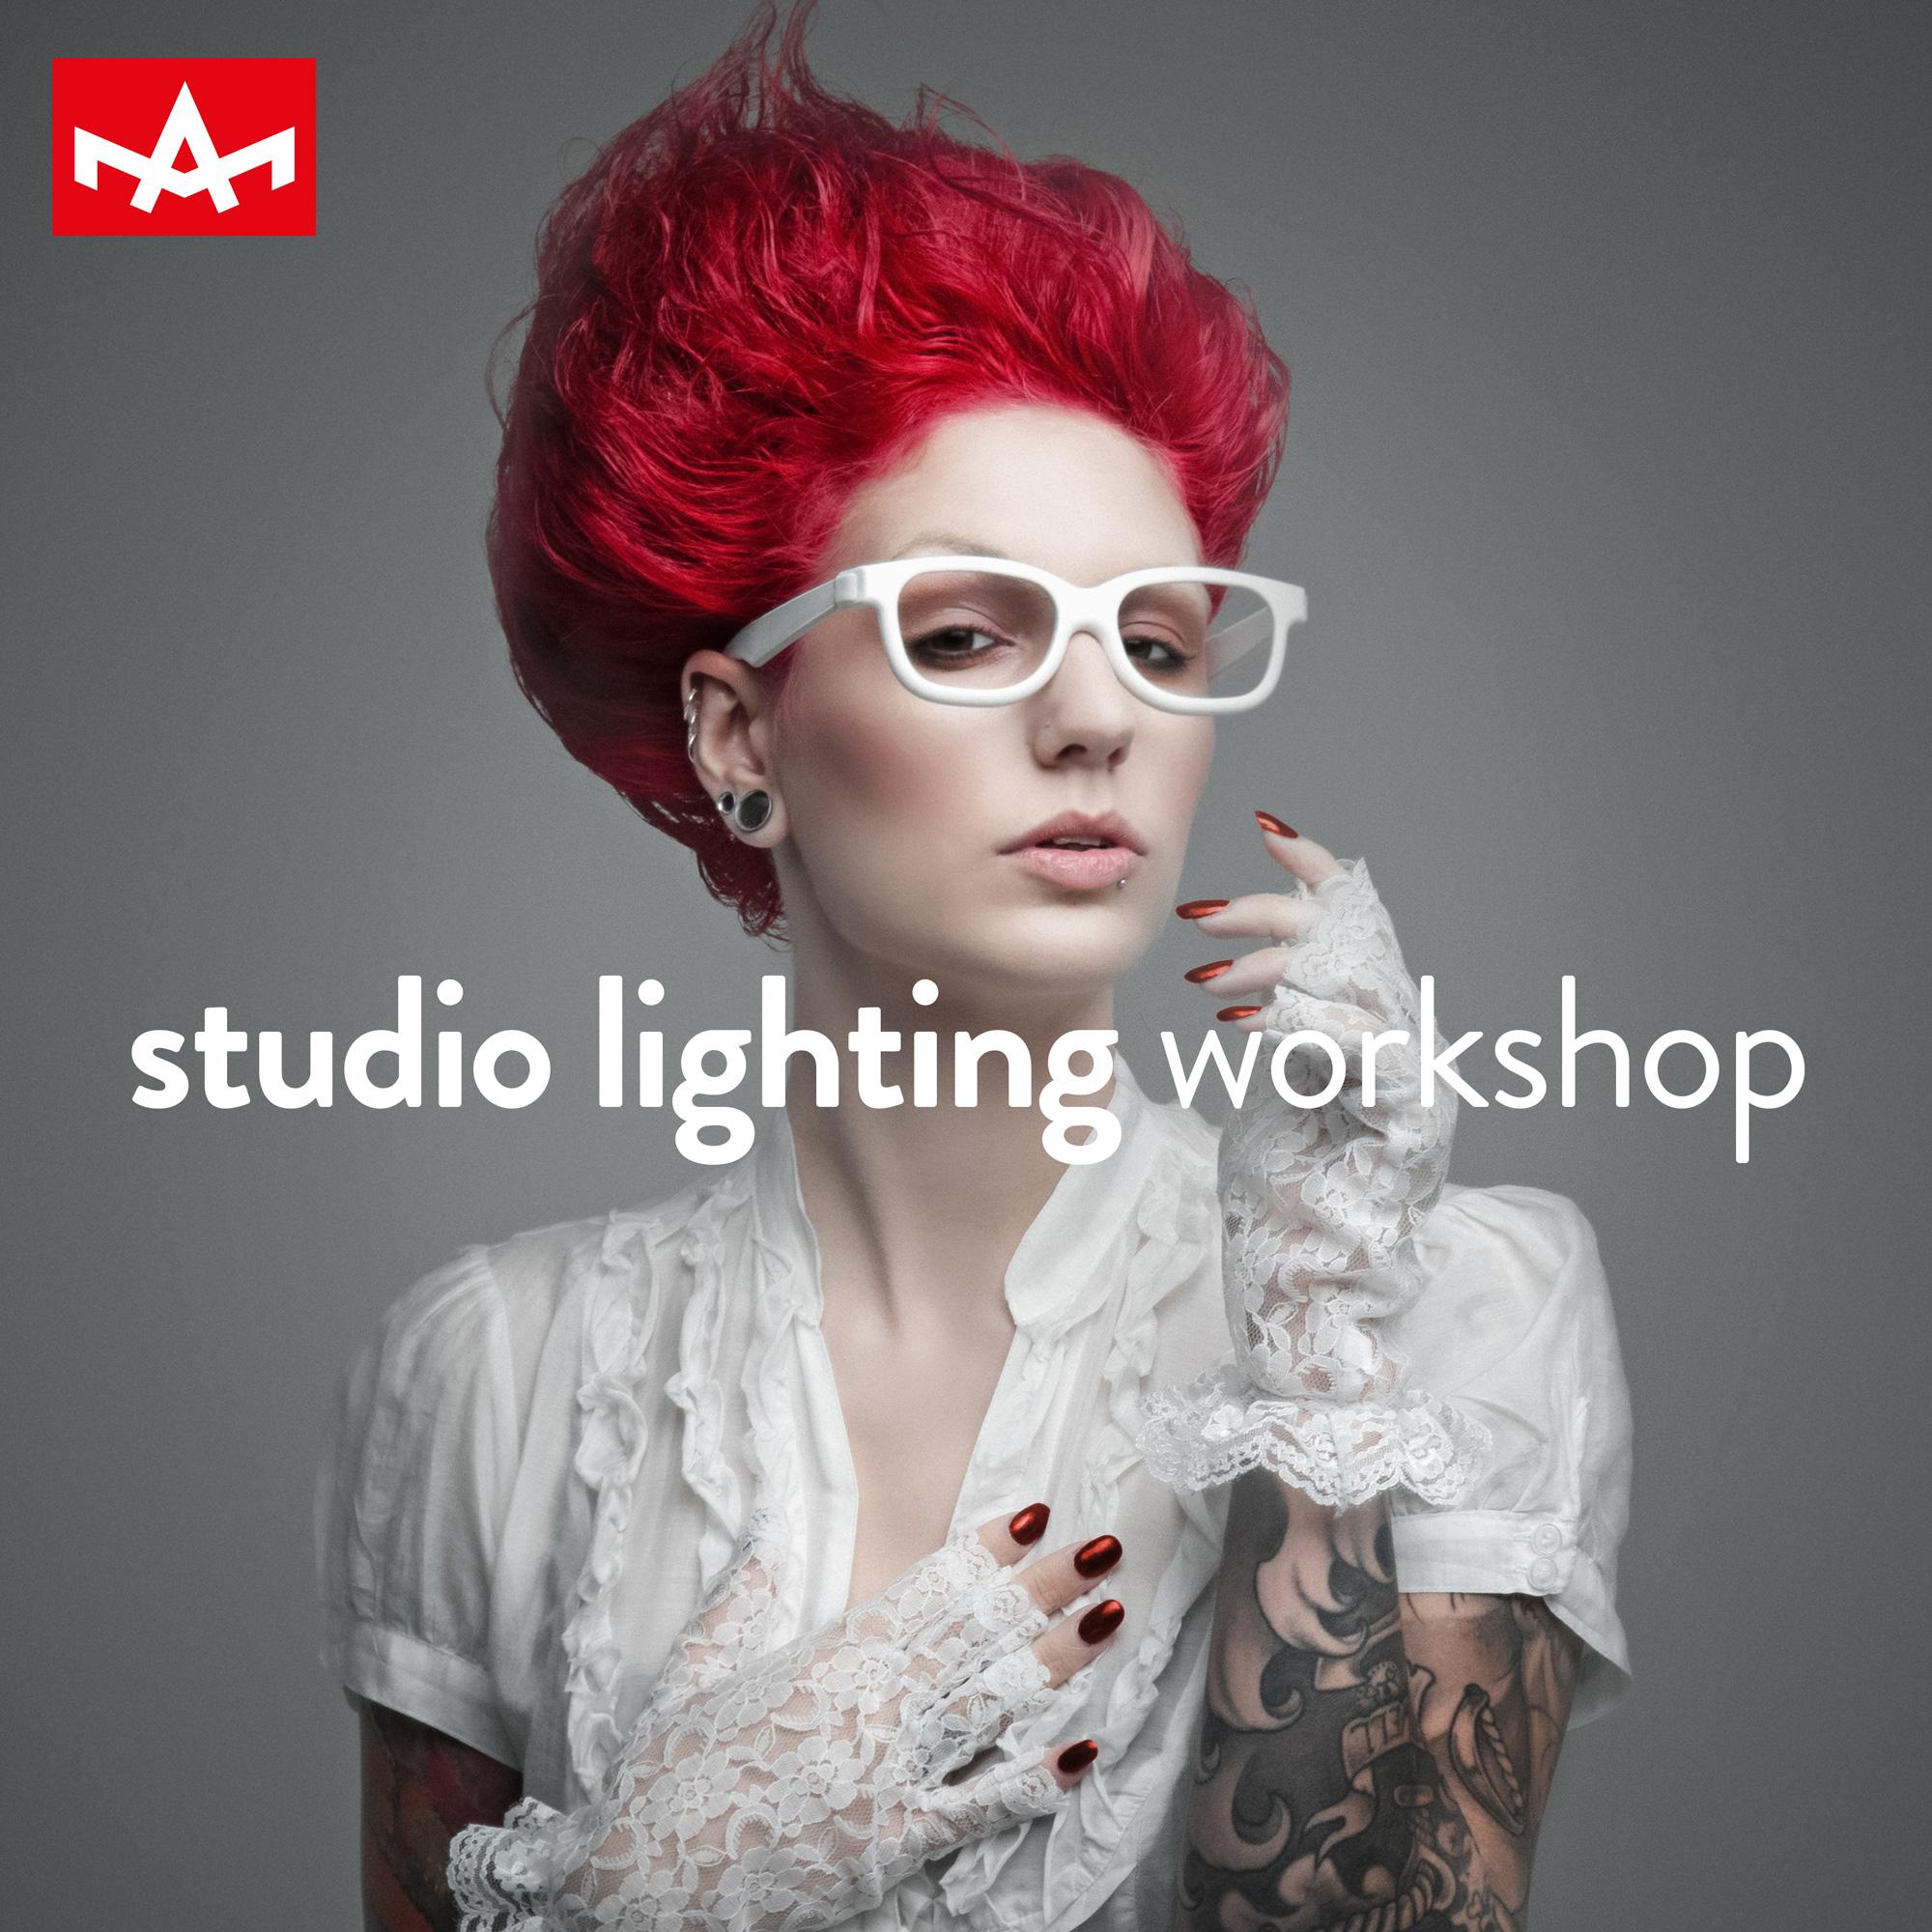 Studio lighting workshop / 12 April 2017